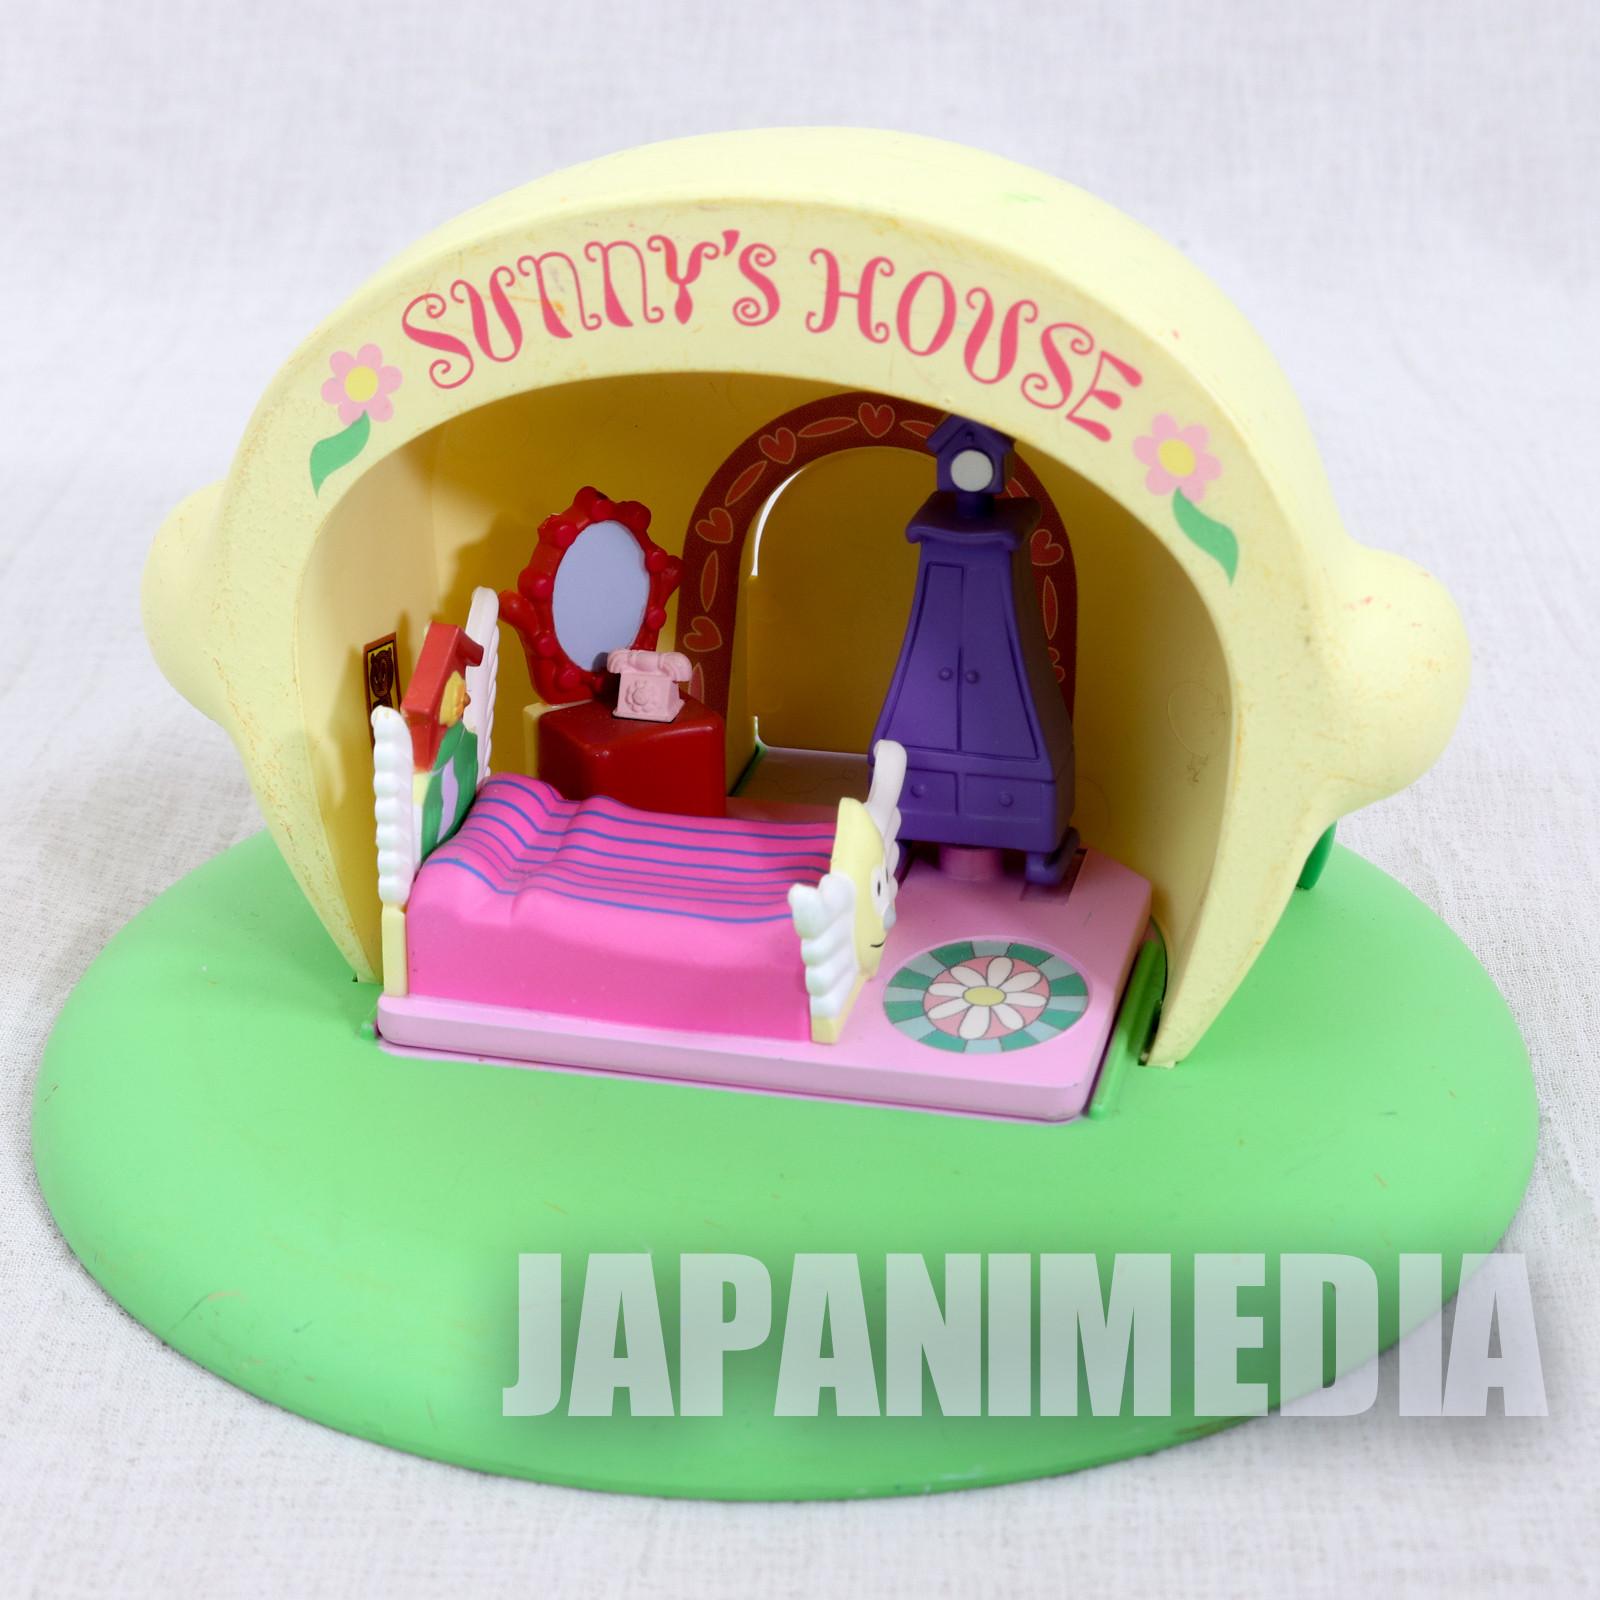 (JUNK DAMAGED) Parappa The Rapper Sunny's Lemon House Miniature House Figure